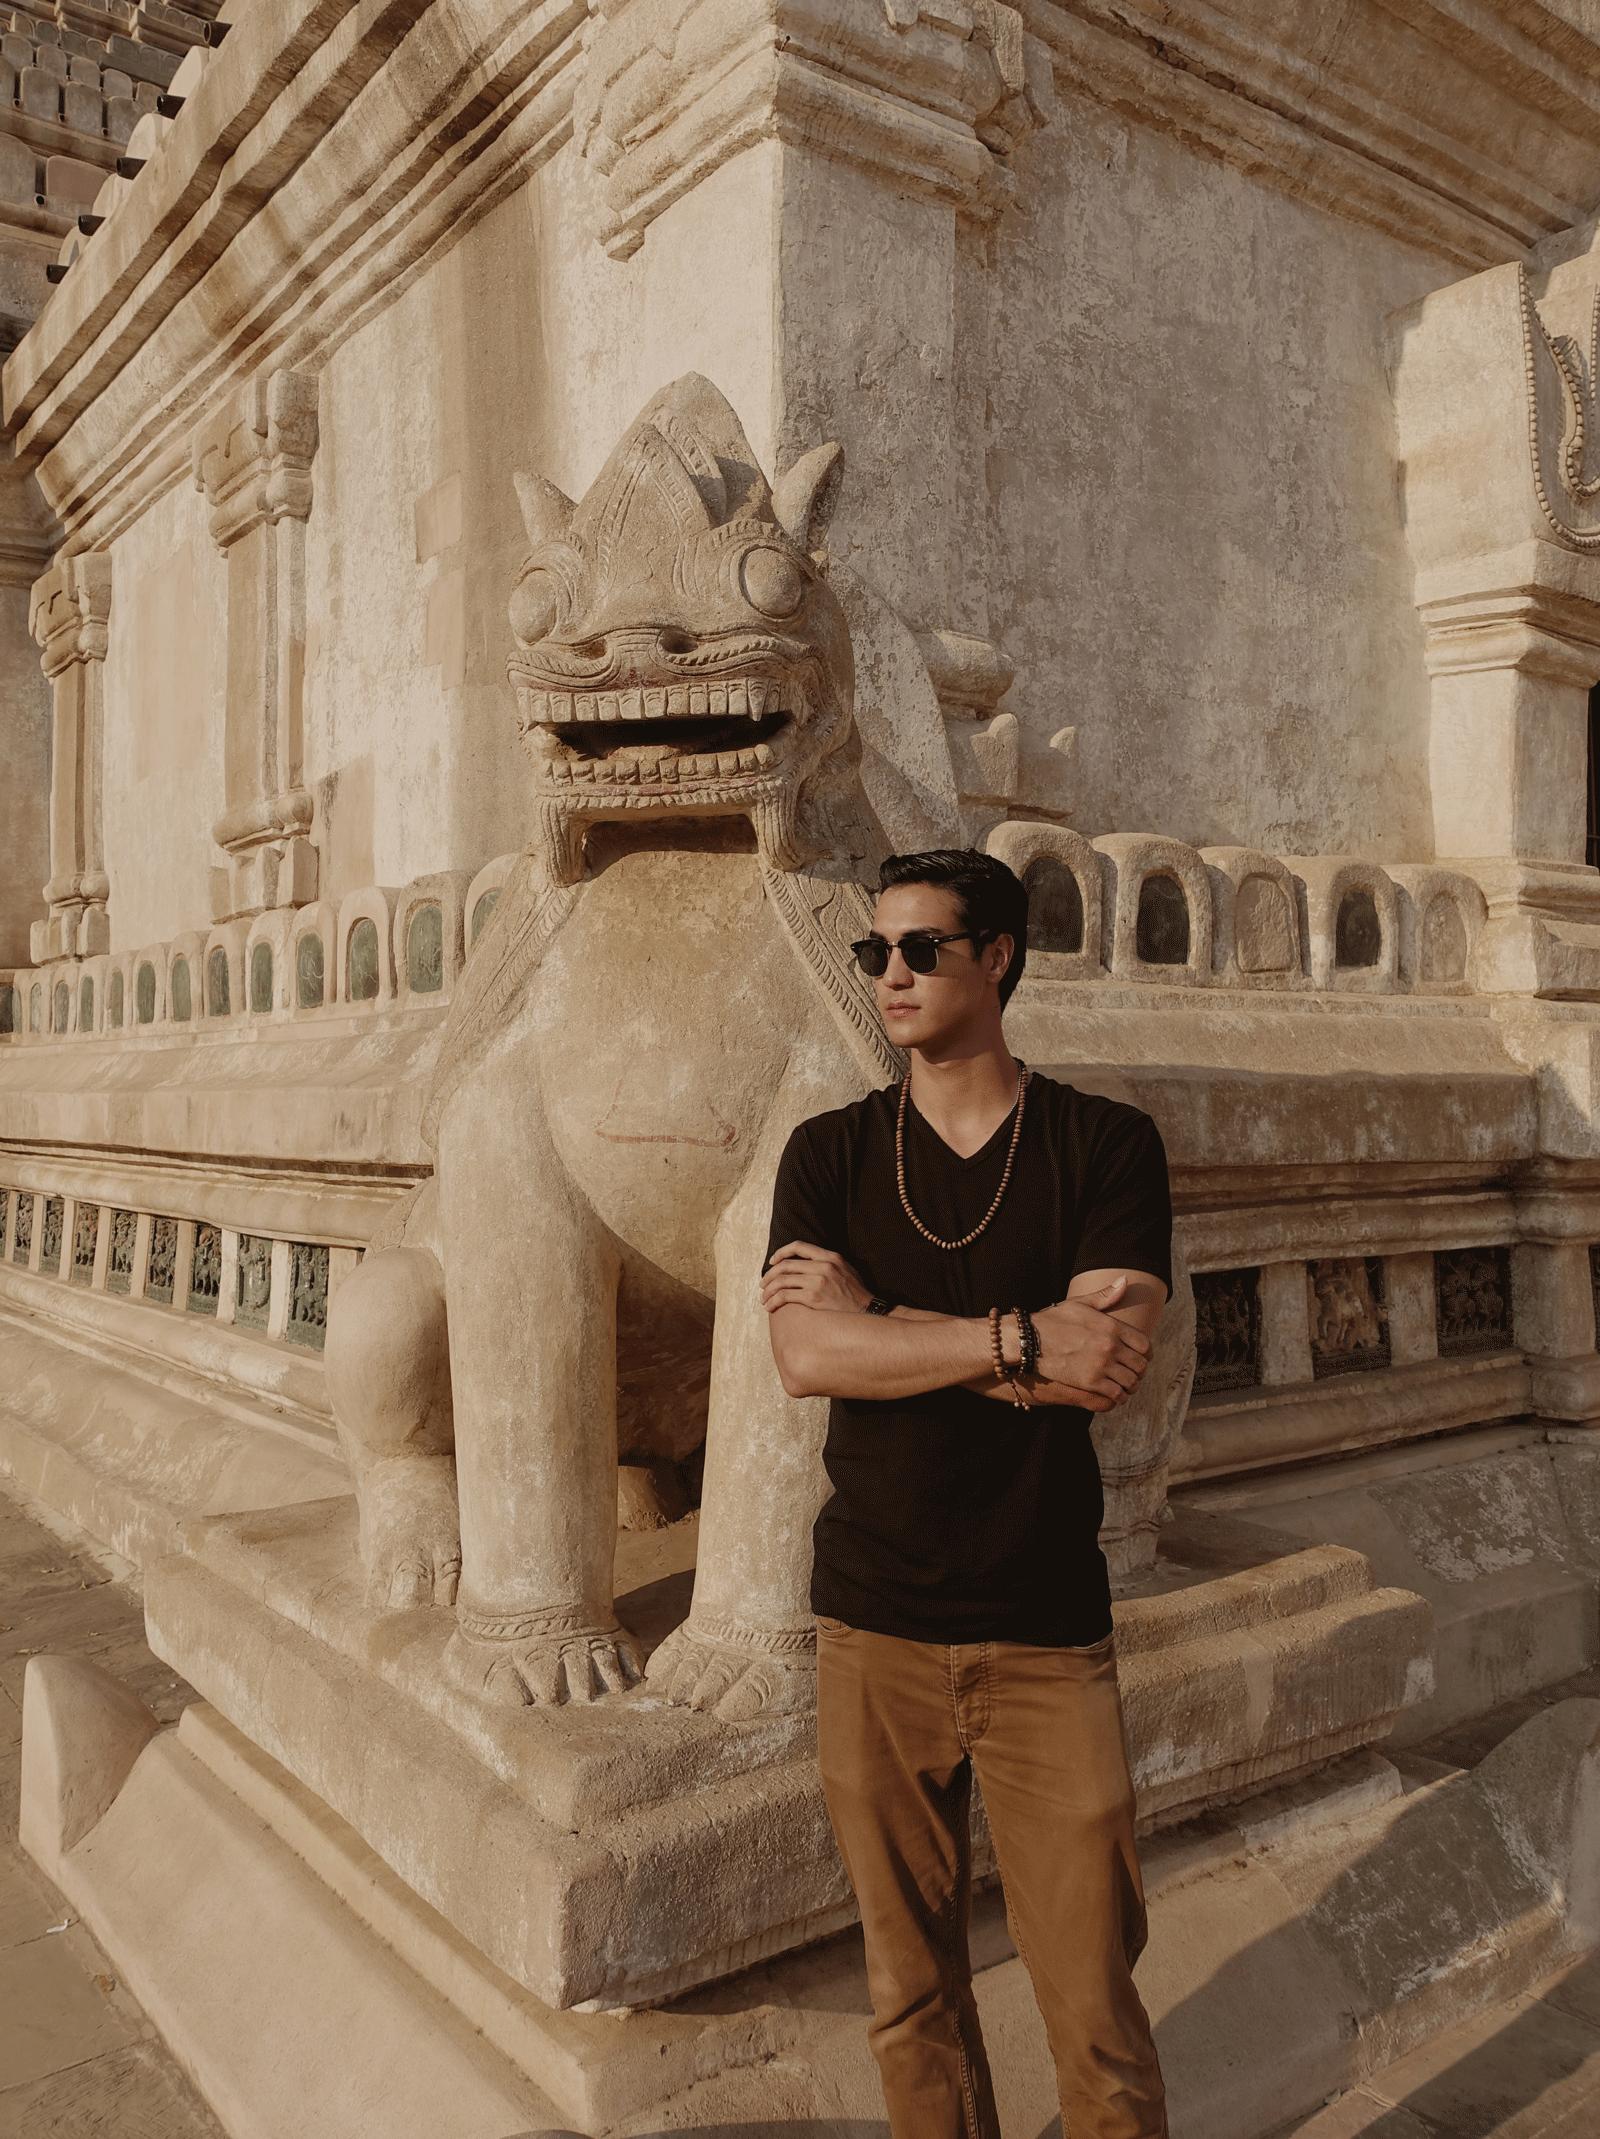 Ananda Temple - Bagan  Tshirt : JOCKEY